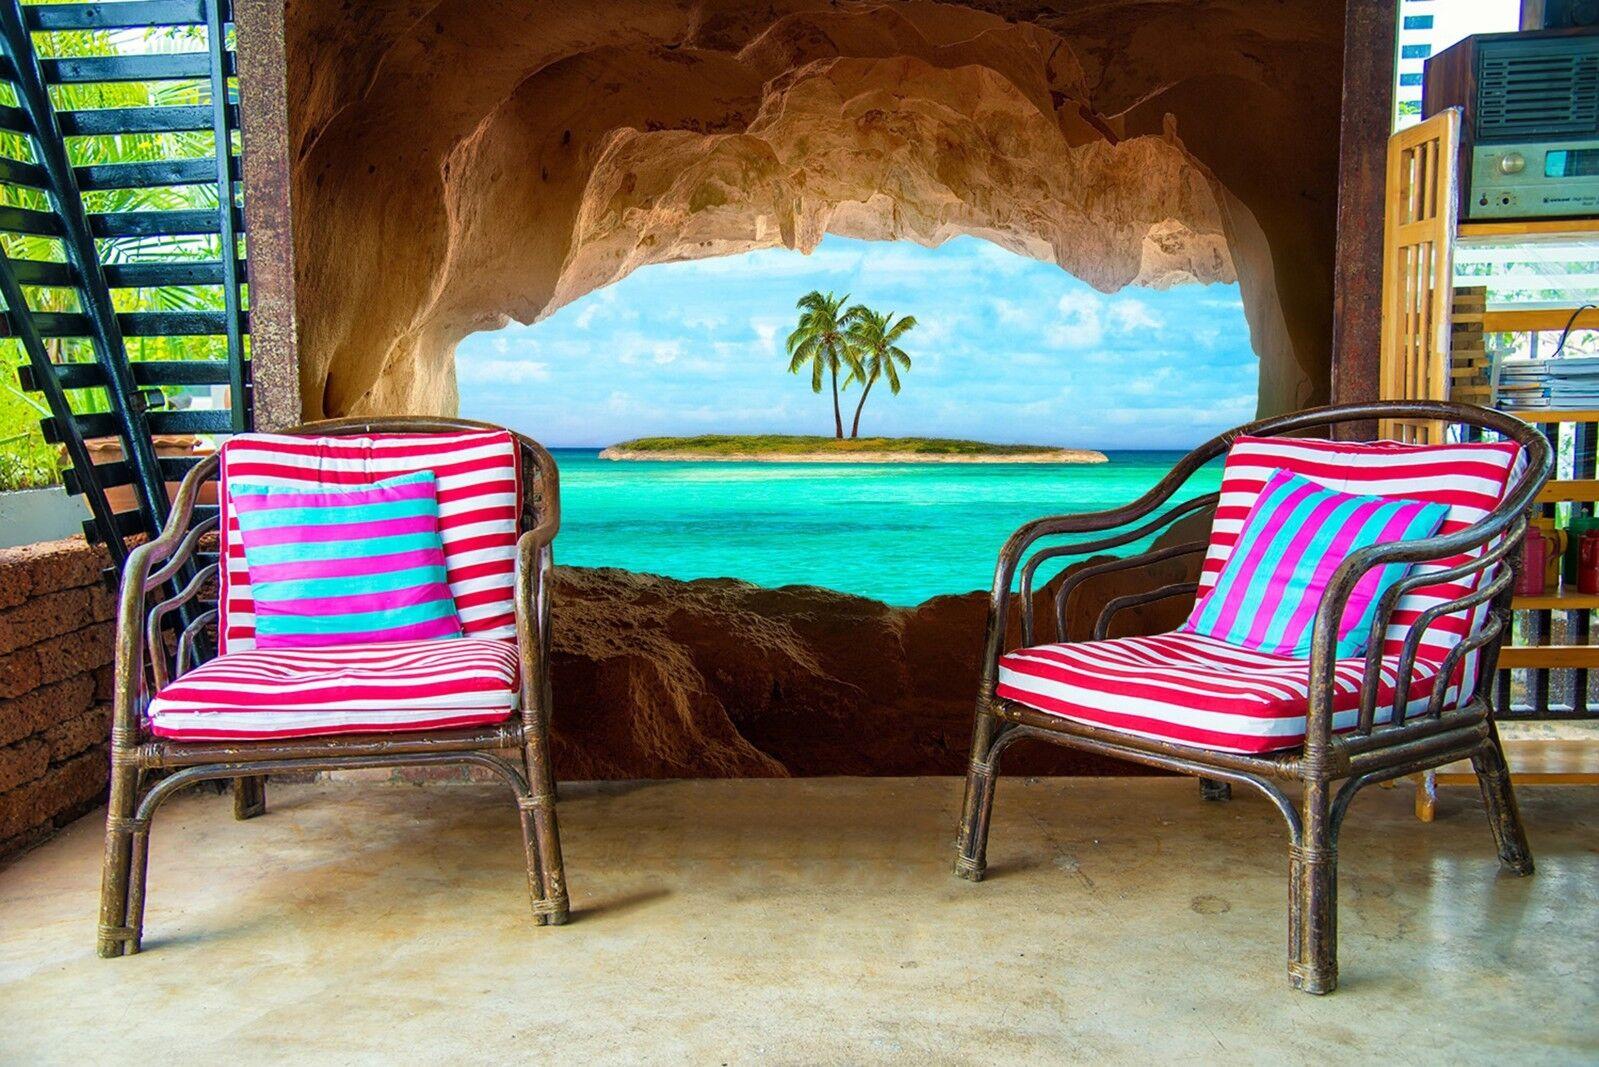 3D Steinhöhle Insel Himmel 8757 Tapete Wandgemälde Tapeten Bild Bild Bild Familie DE Lemon | Kostengünstiger  | Preiszugeständnisse  | Online Outlet Store  9e1546